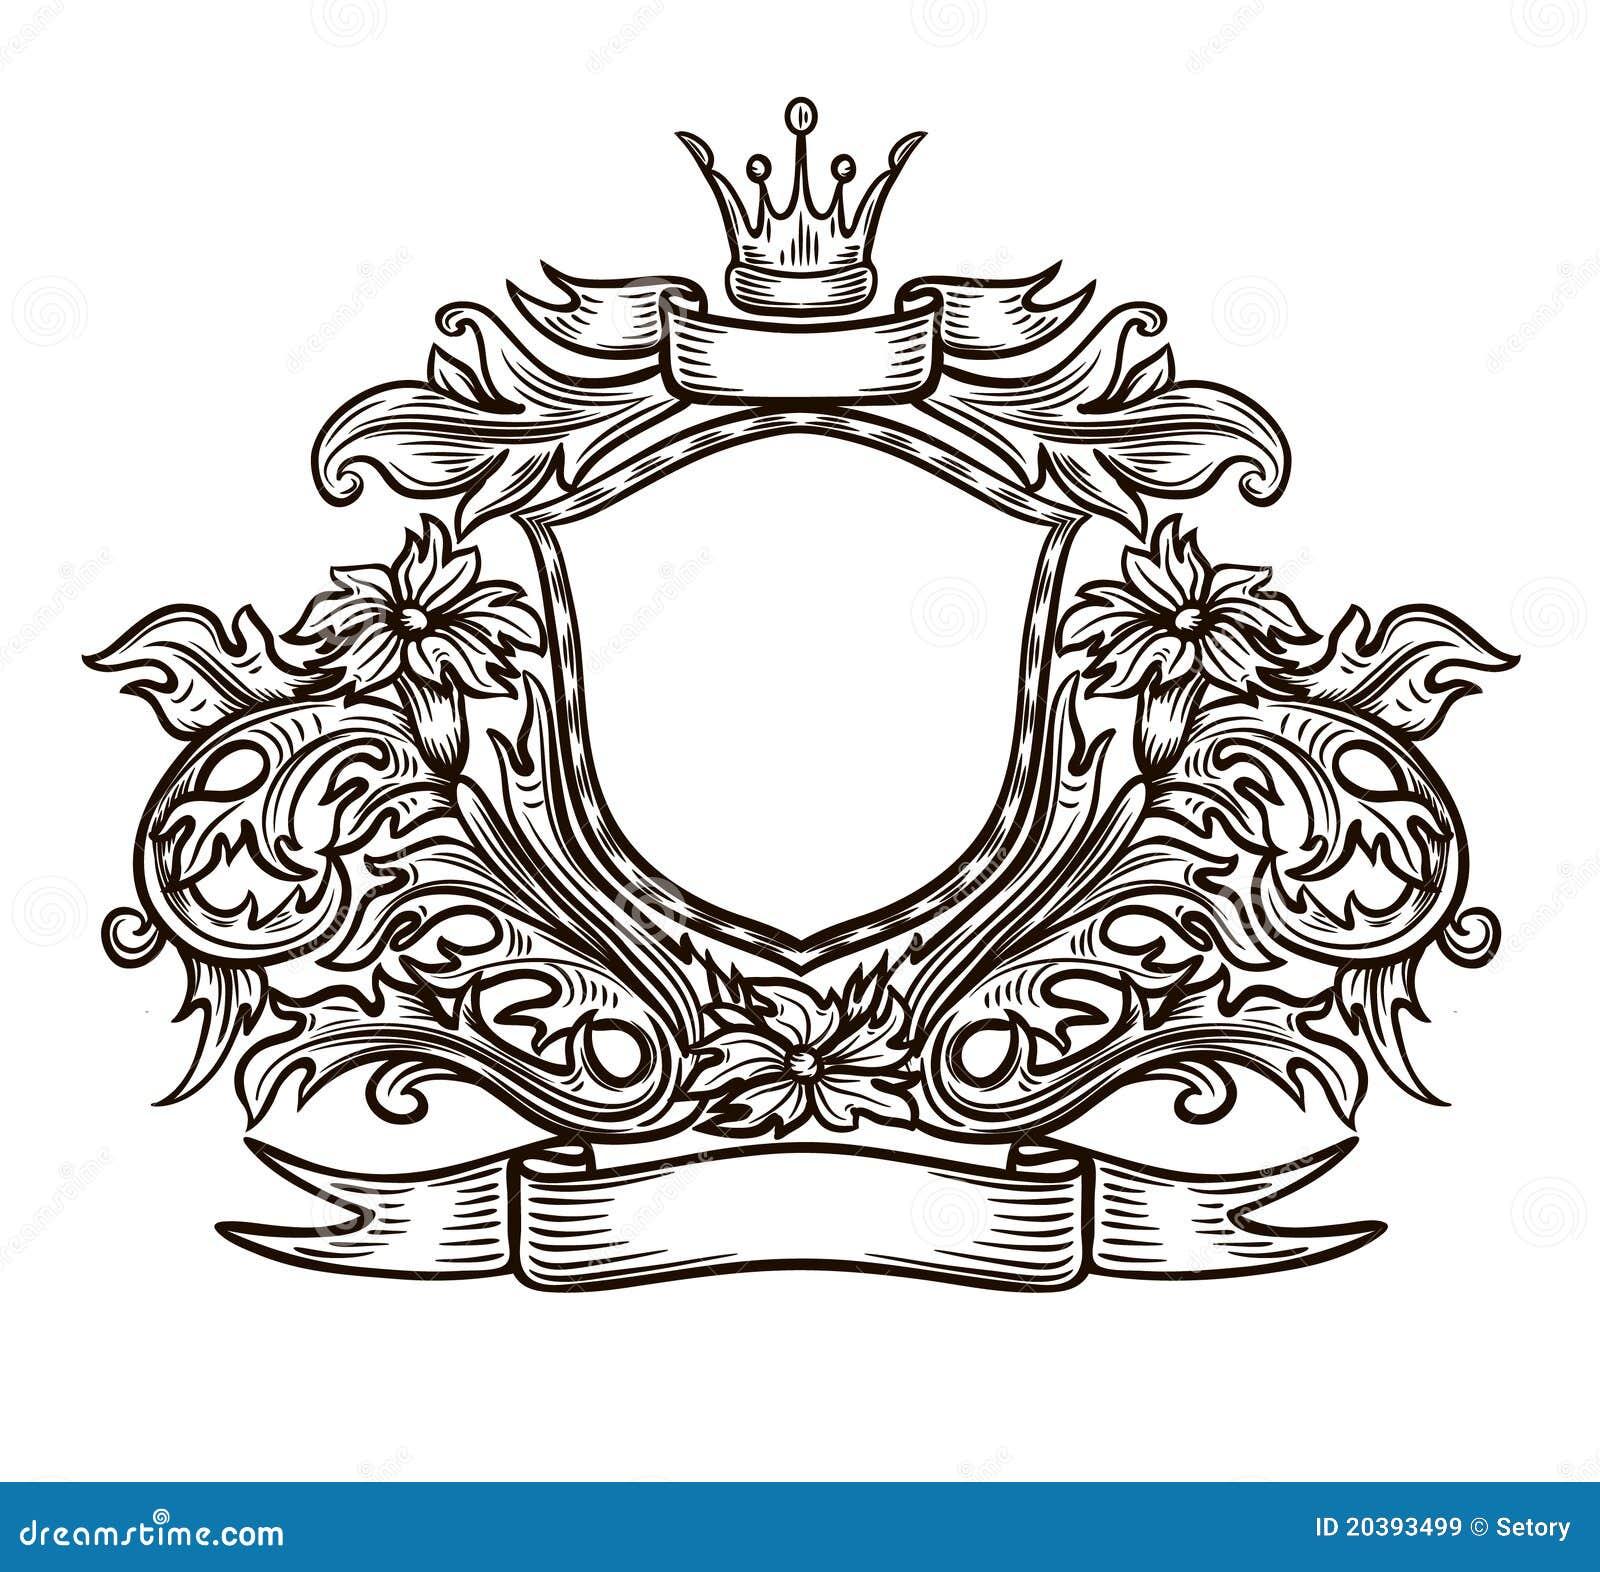 Black And White Emblem Royalty Free Stock Images Image